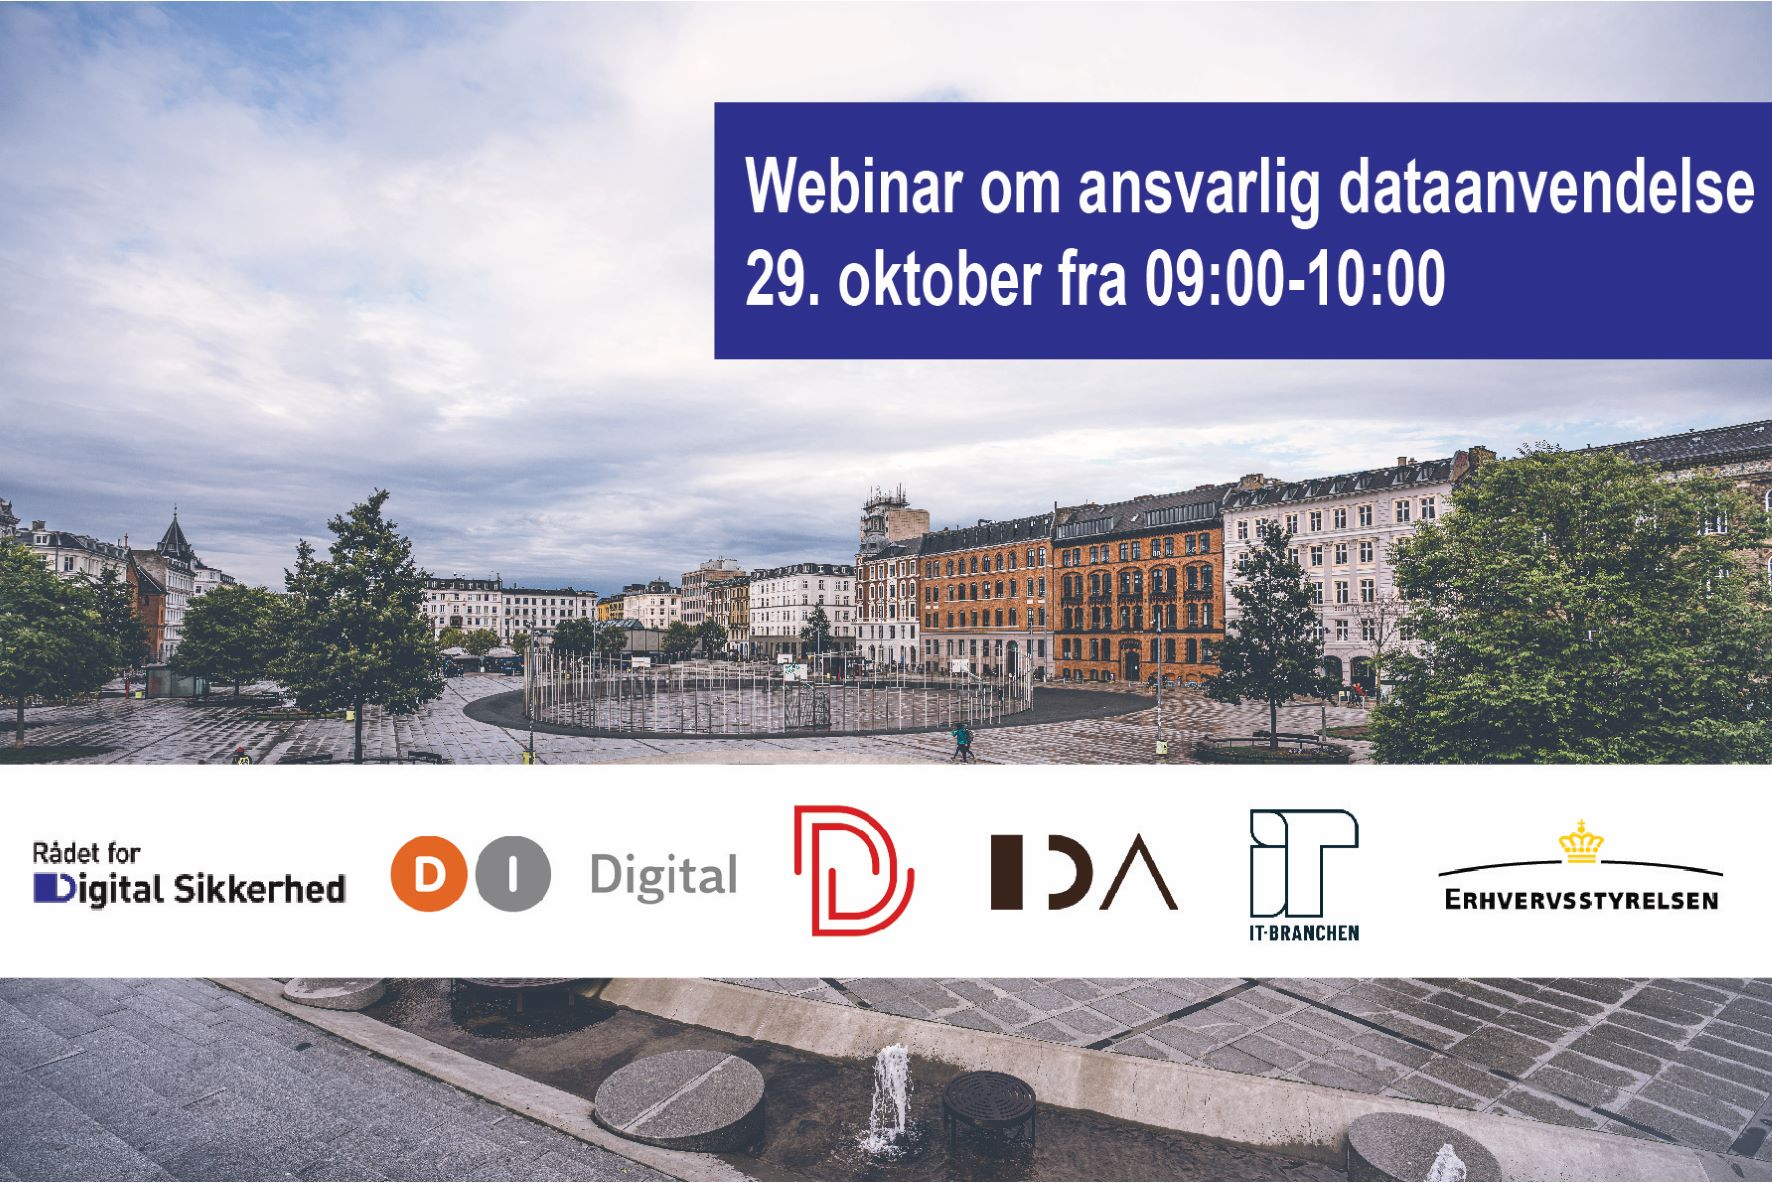 Webinar om ansvarlig dataanvendelse 29 oktober 2021